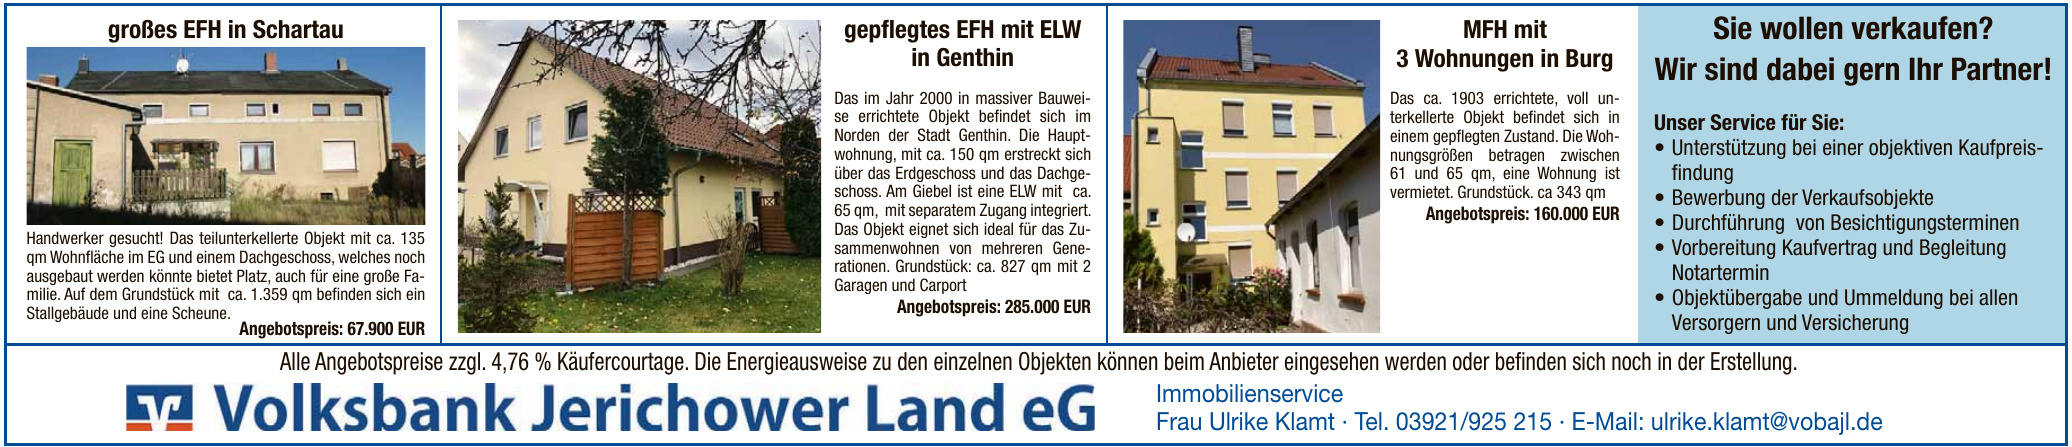 Volksbank Jerichower Land eG-Frau Ulrike Klamt